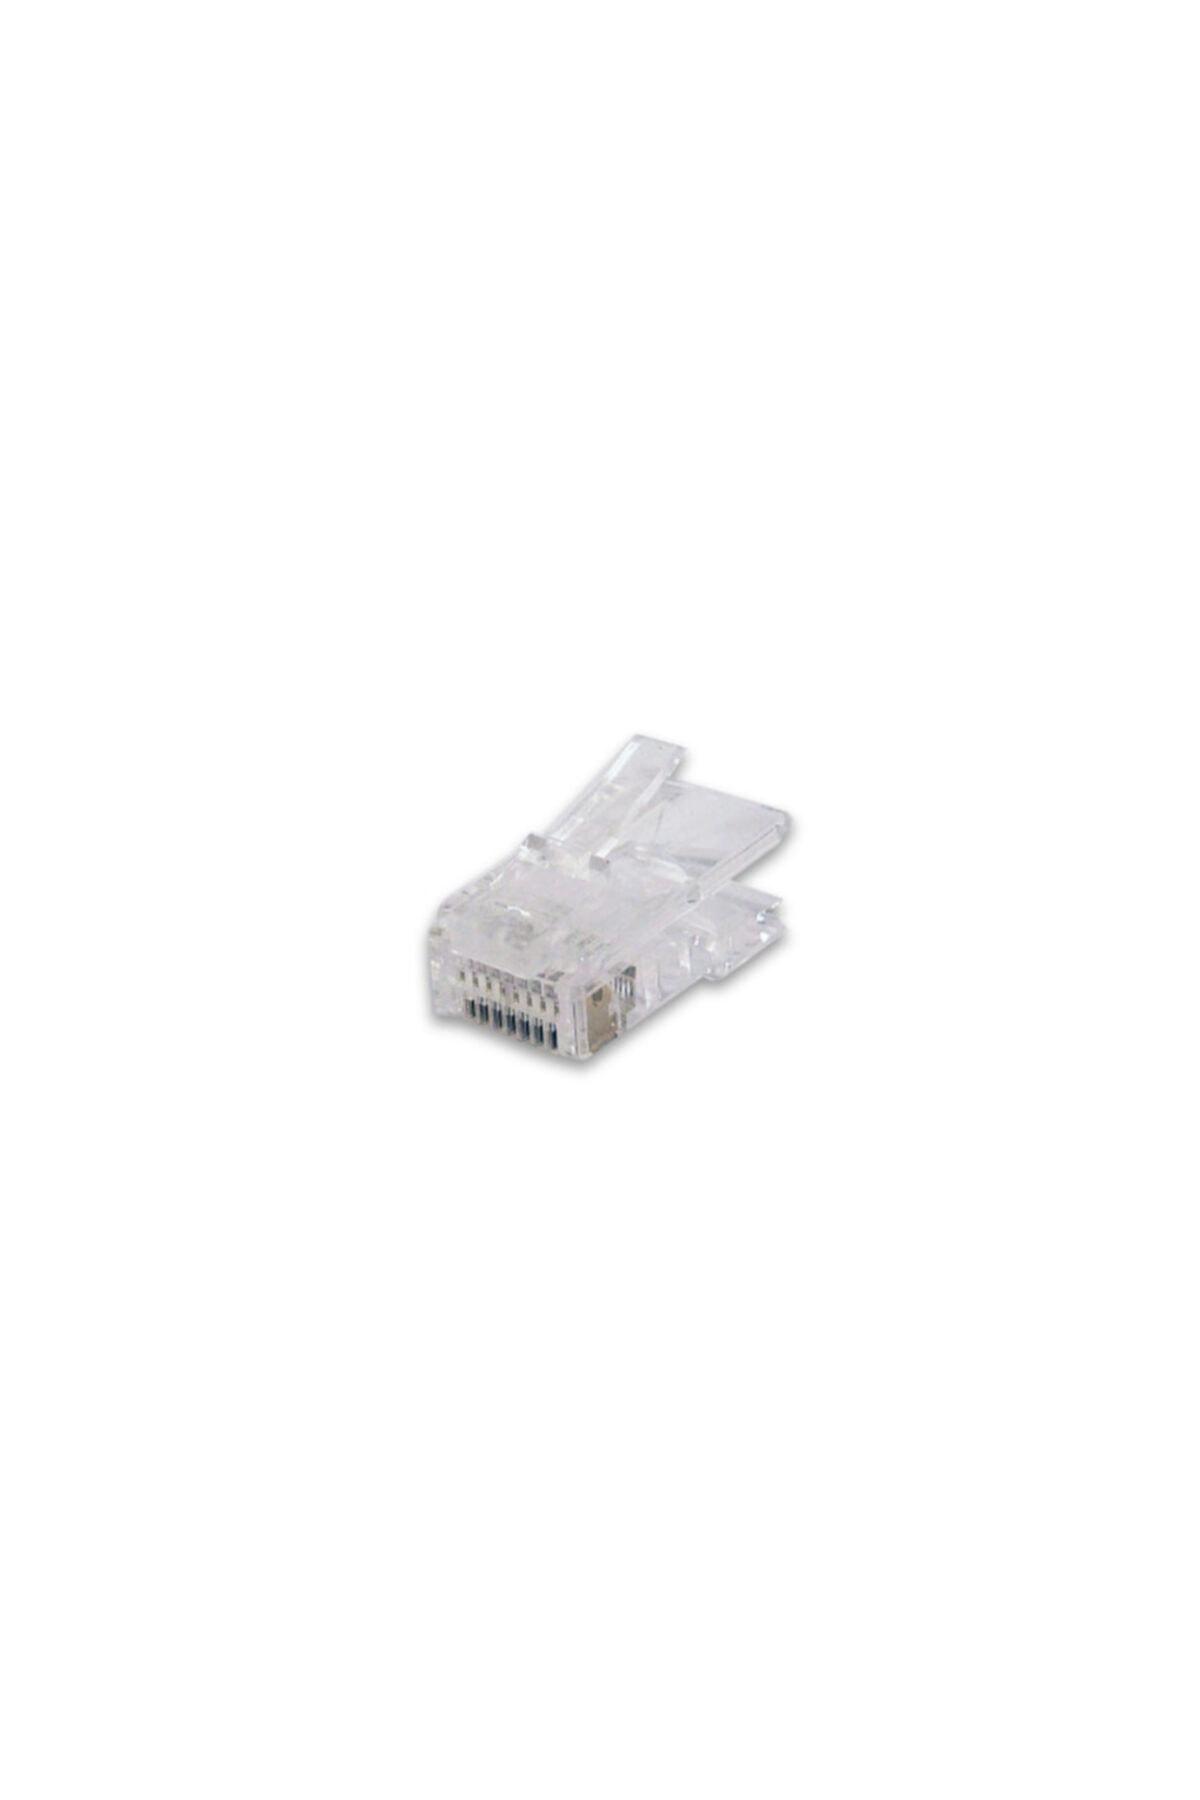 Modüler Fiş Category 5e Rj45 8p8c Zırhsız Yuvarlak Kablo Tipi 100 Lük Paket